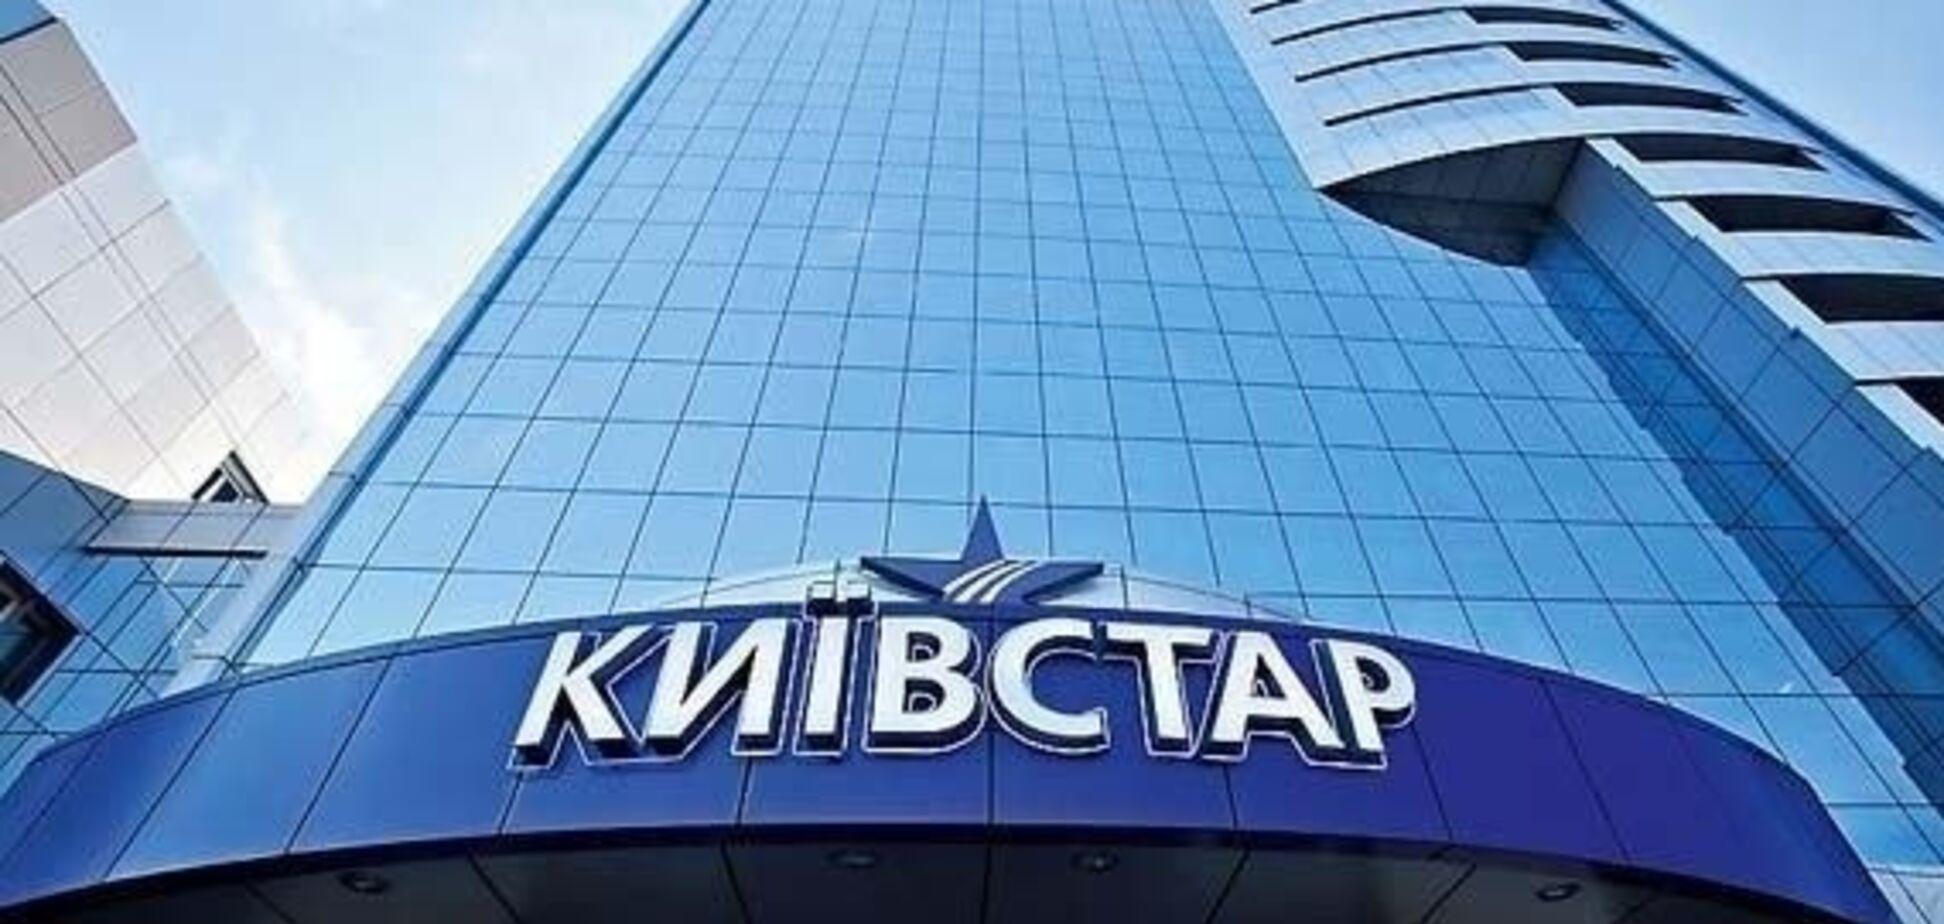 Київcтар включив зв'язок 4G ще в 133 населених пунктах